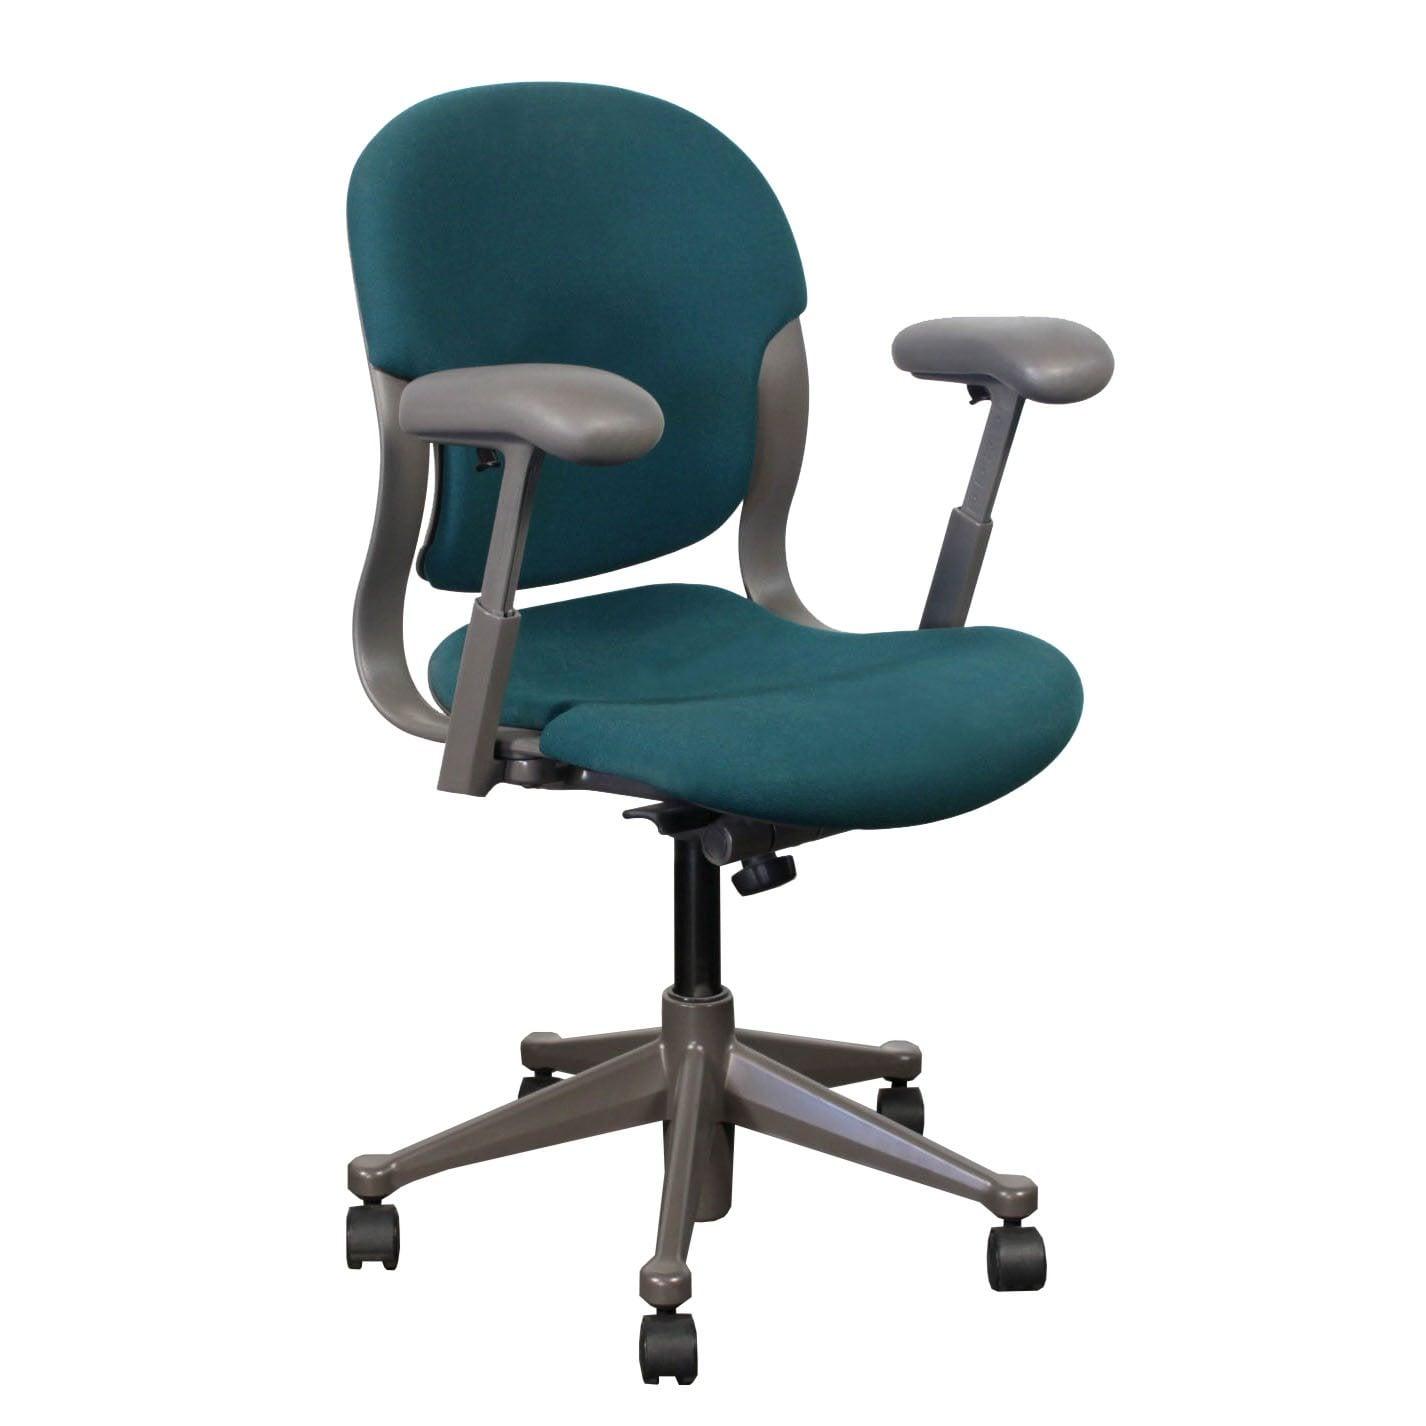 teal office chair rio beach herman miller used equa task national